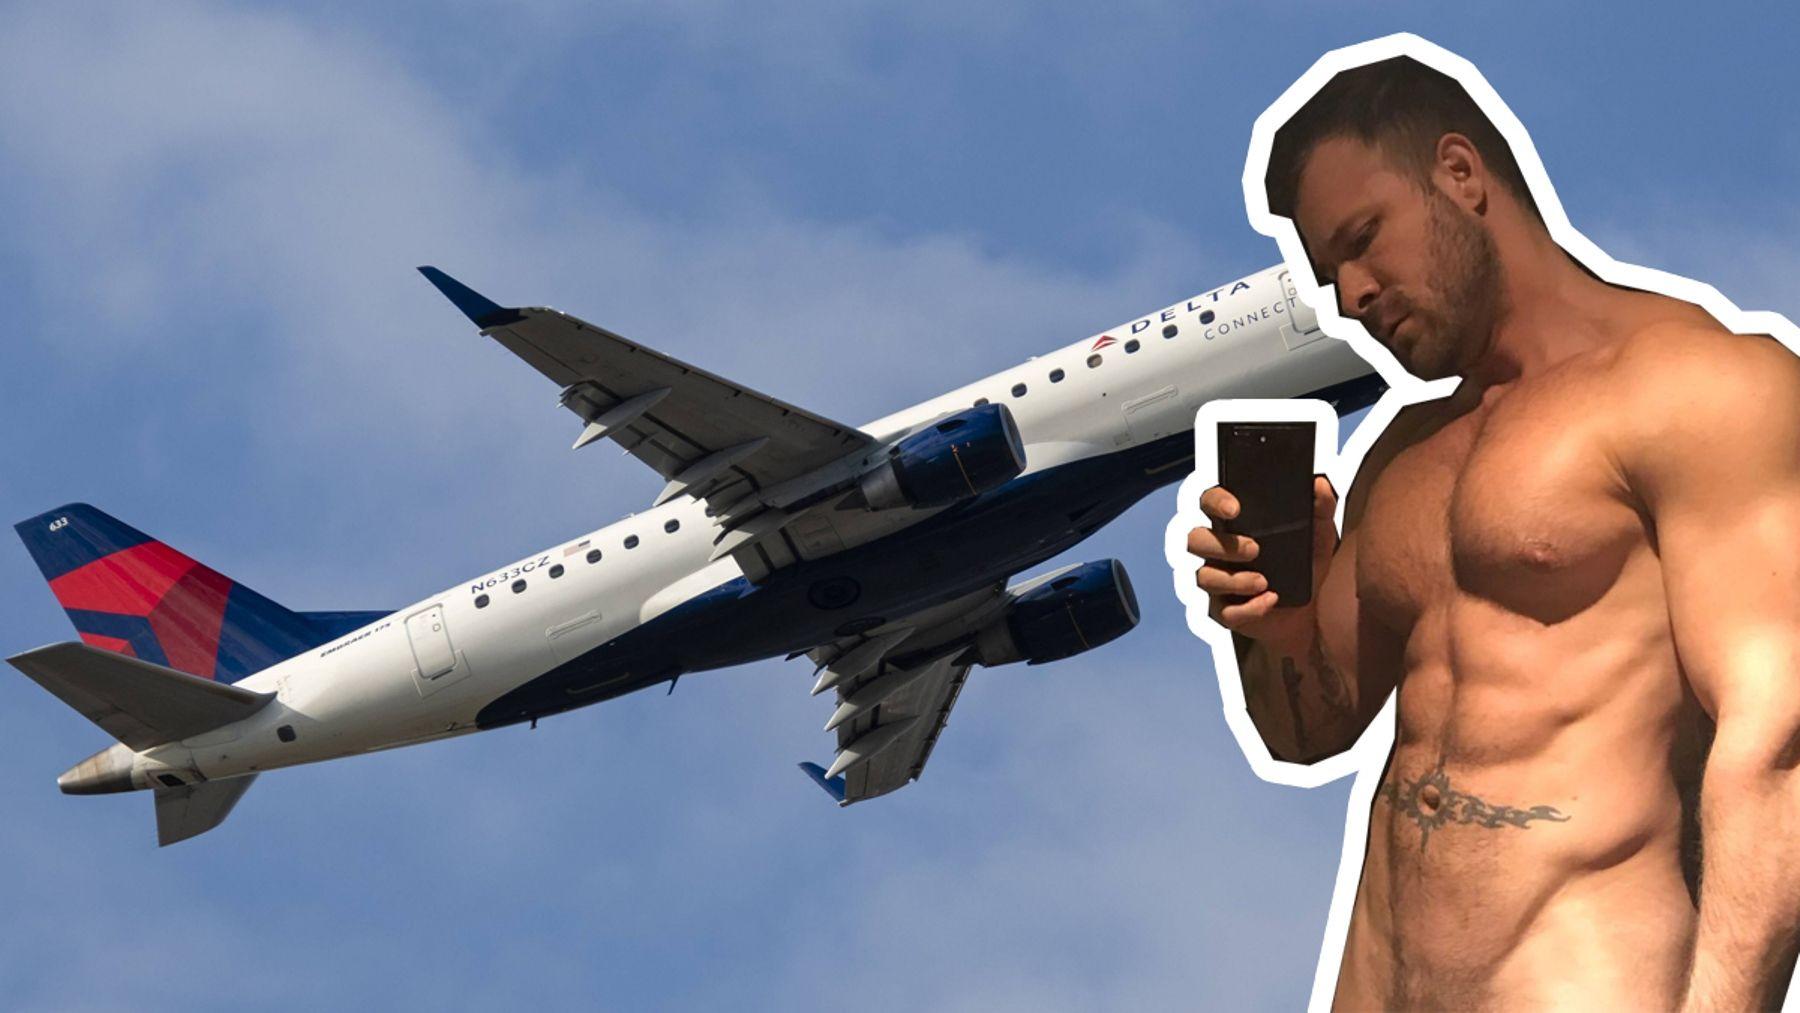 Flugzeug porno